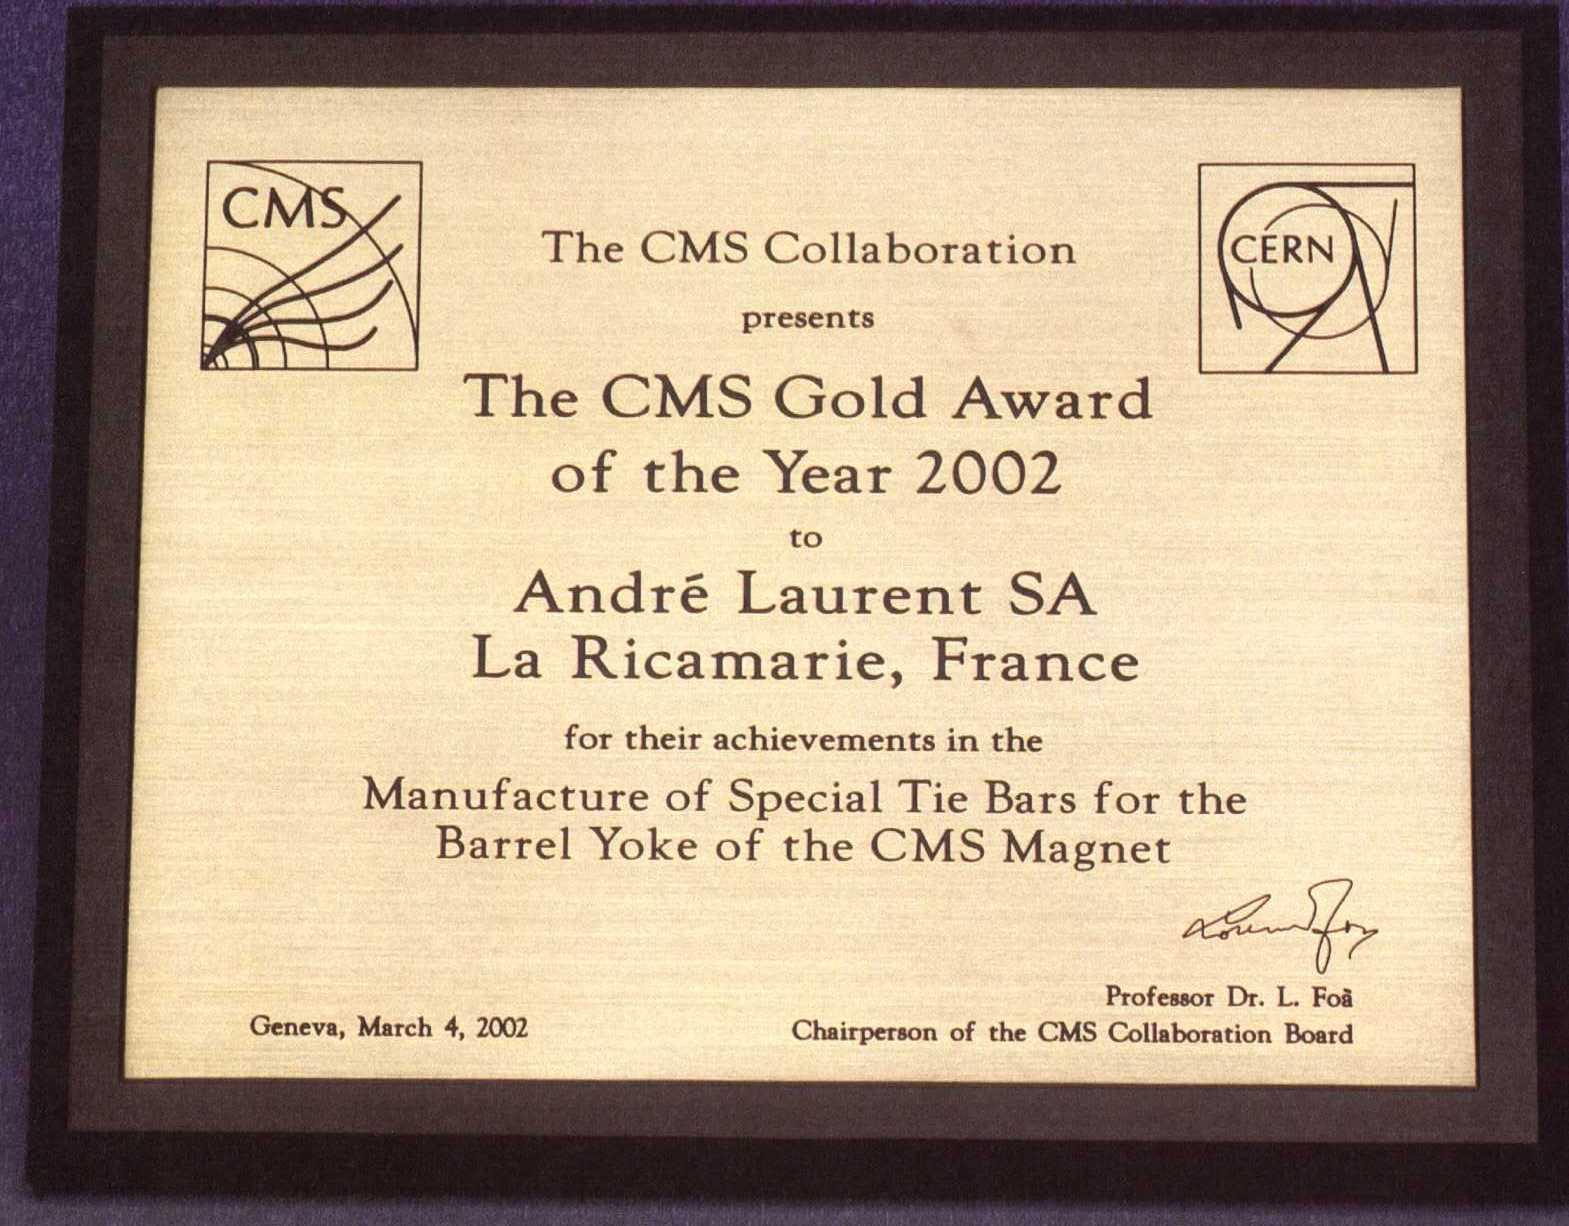 Gold Award for Special Tie Bars for Barrel Yoke (CMS MAGNET)